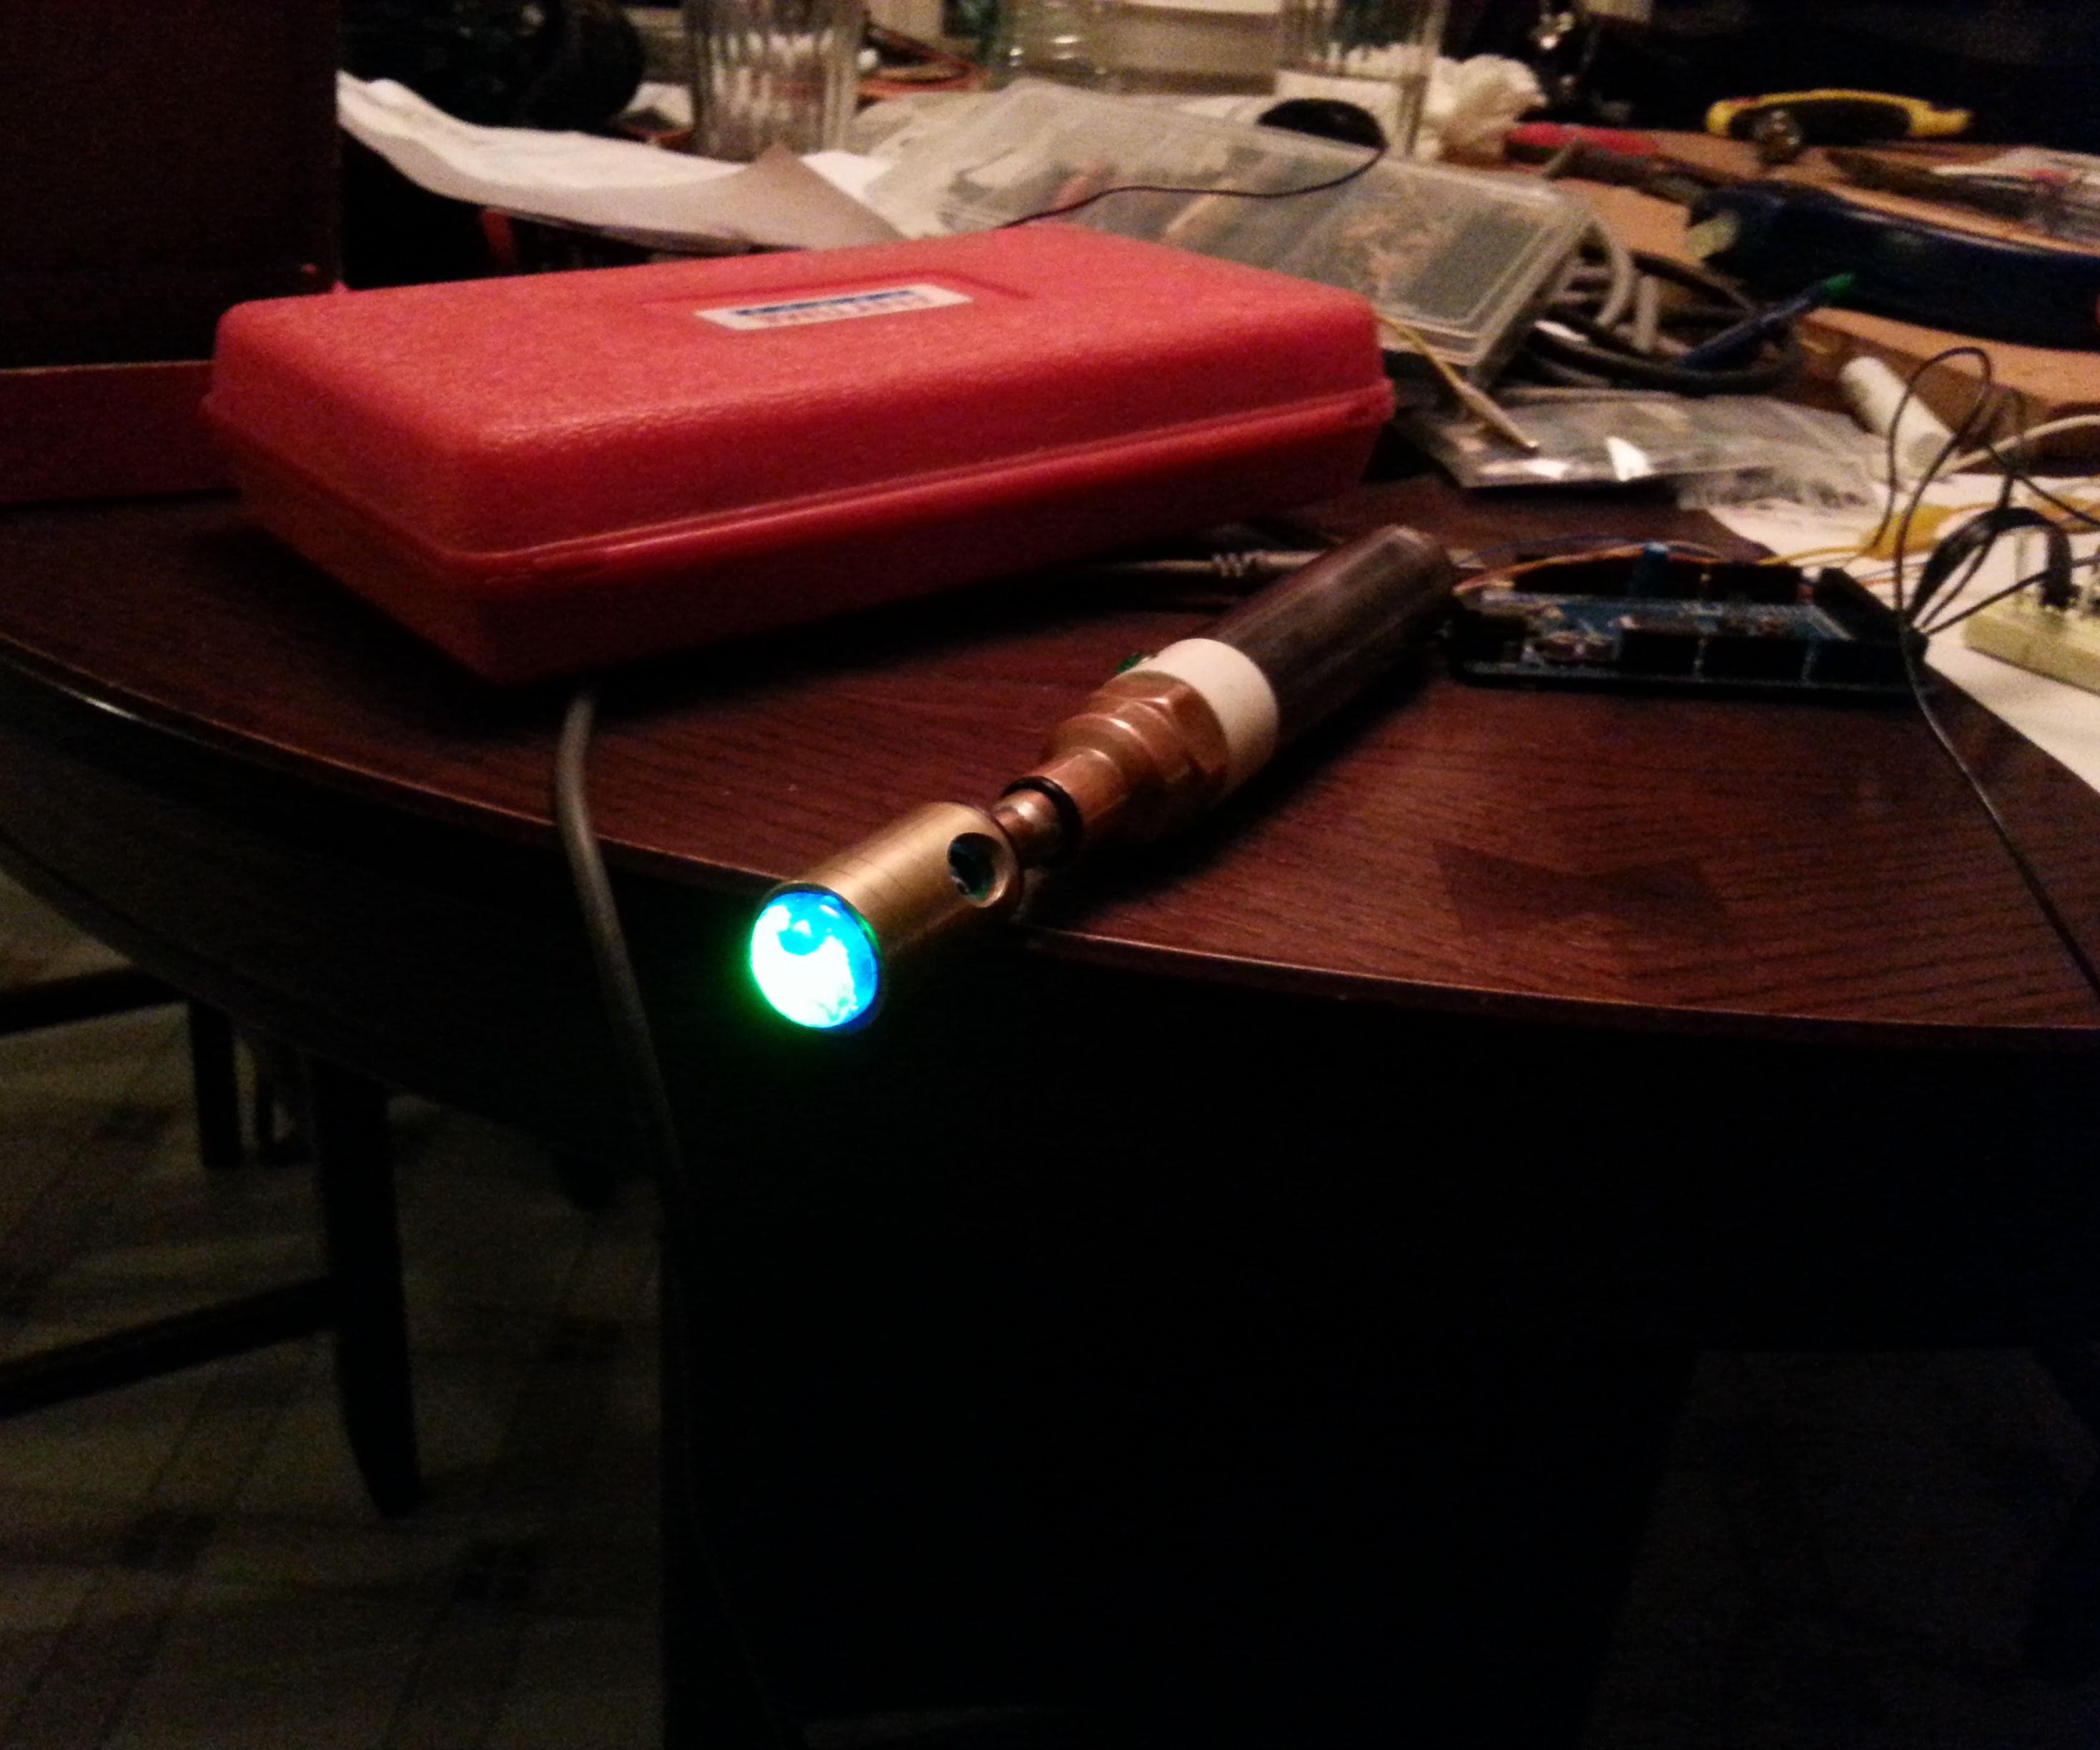 Working Sonic Screwdriver - Version 3.0